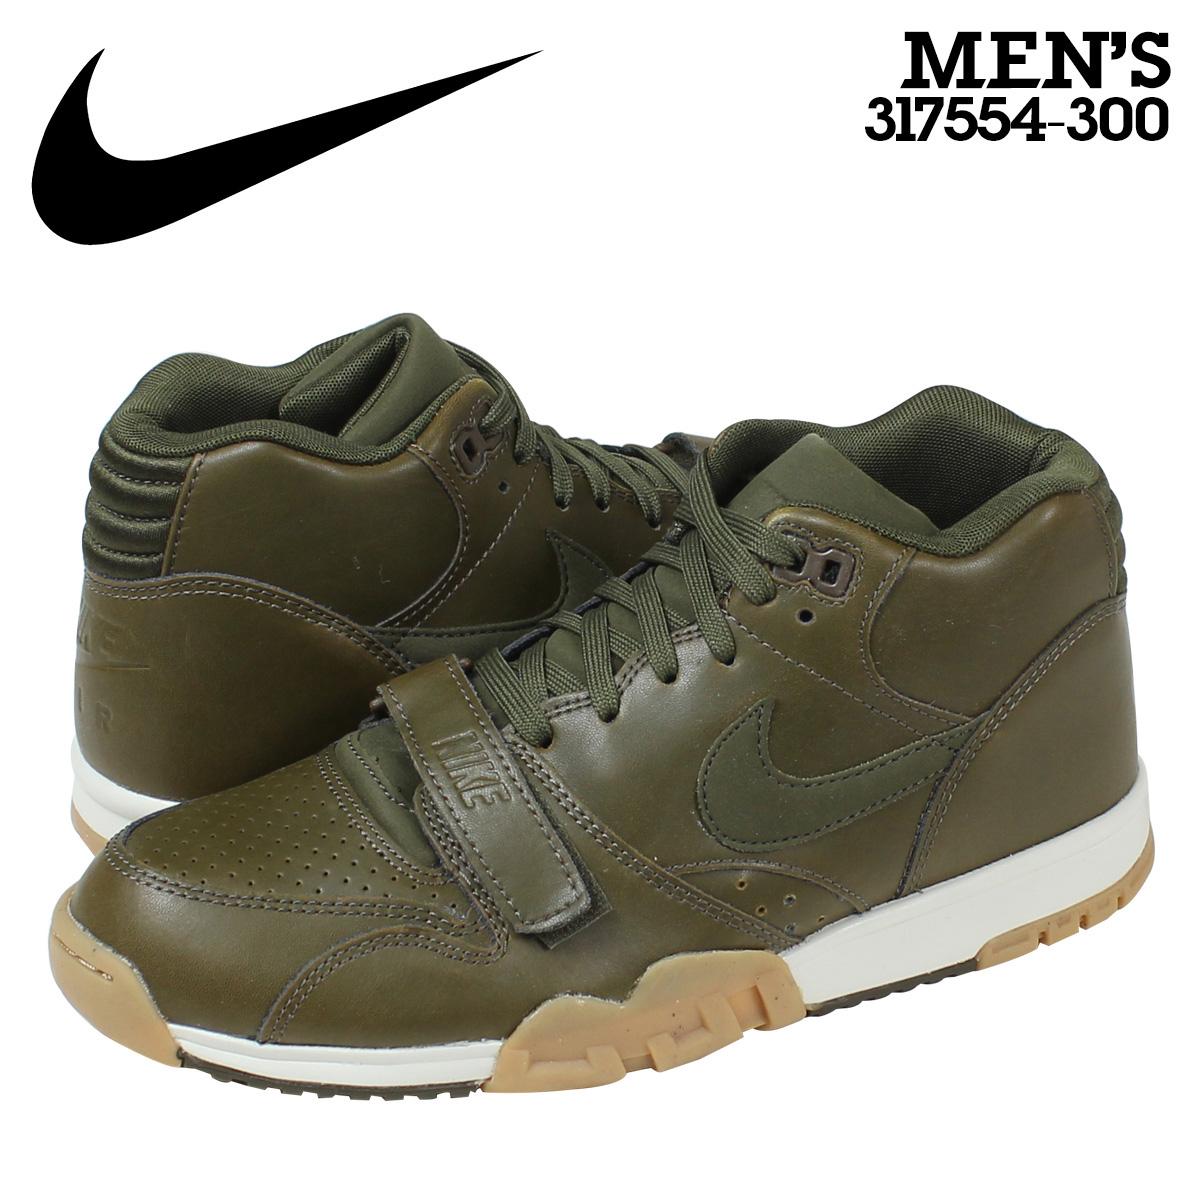 quality design 40959 a4ef7 Nike NIKE air trainer sneakers AIR TRAINER 1 MID air trainer 1 mid 317554 -  300 mens shoes Brown